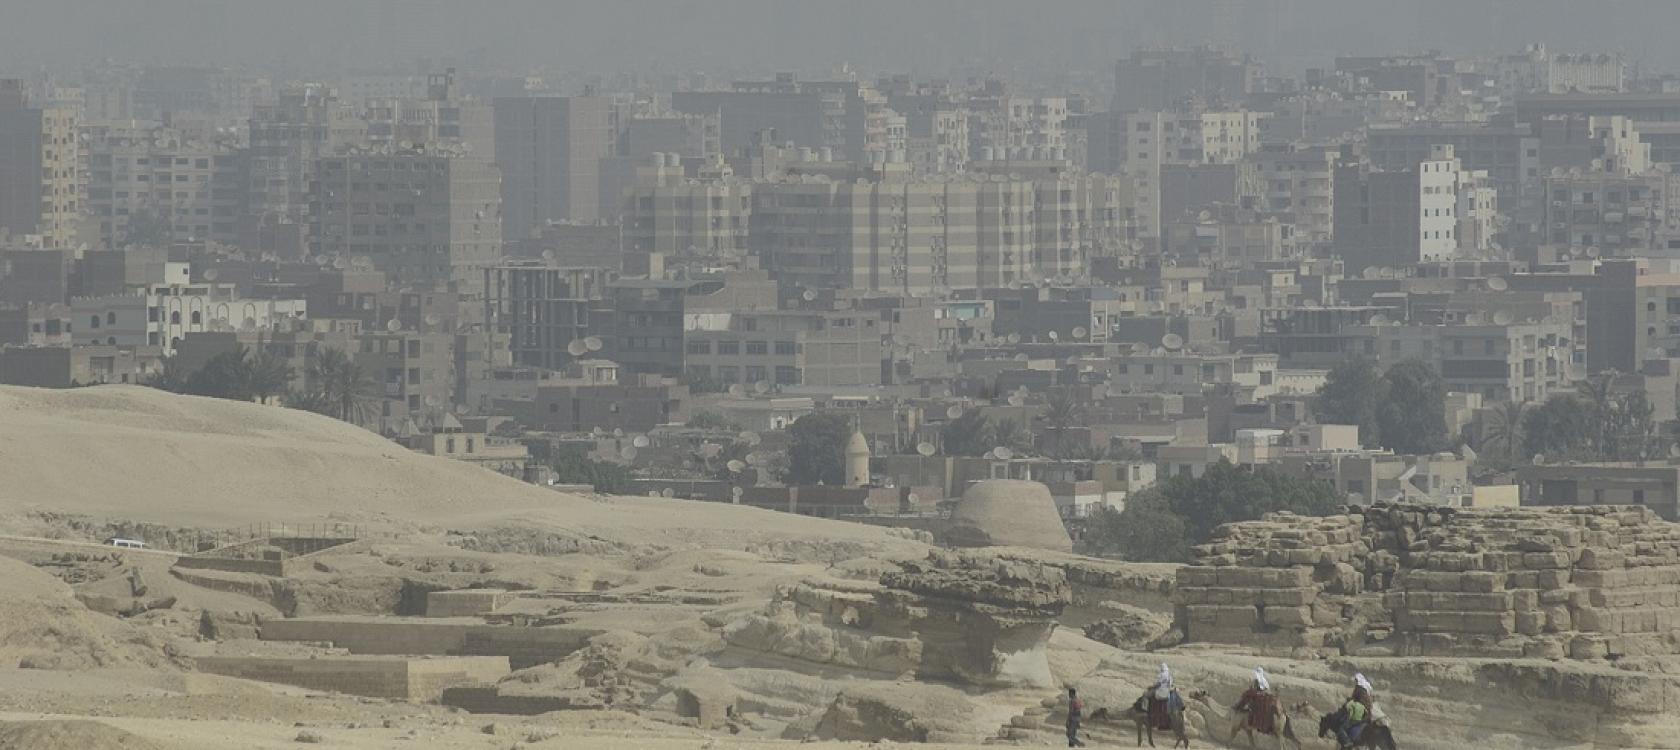 Cairo, Egypt, Gentilhomme, city